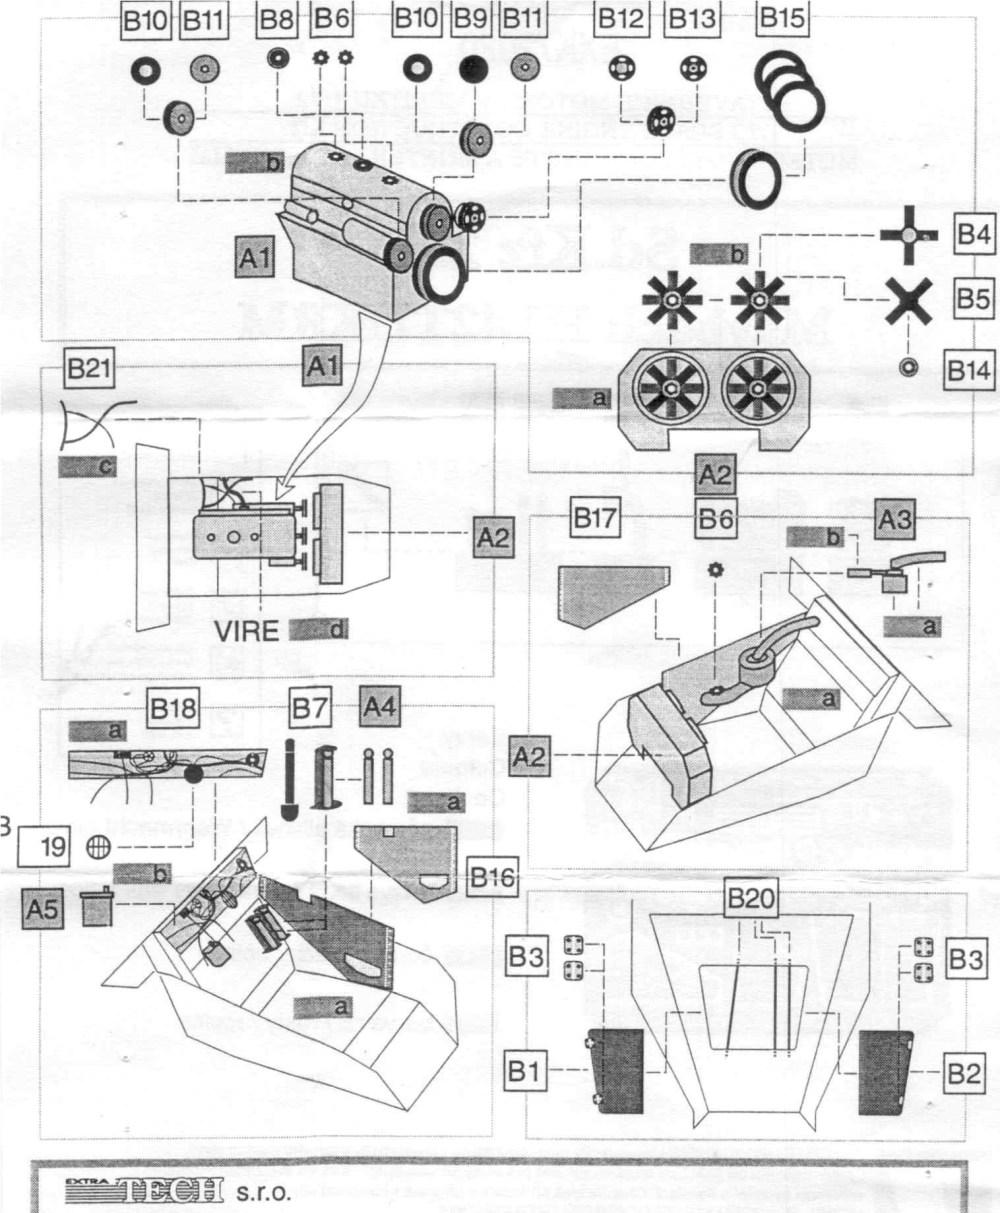 medium resolution of extratech exk bach hltukrrm sd kfz engine set at far left is extra tech s resin